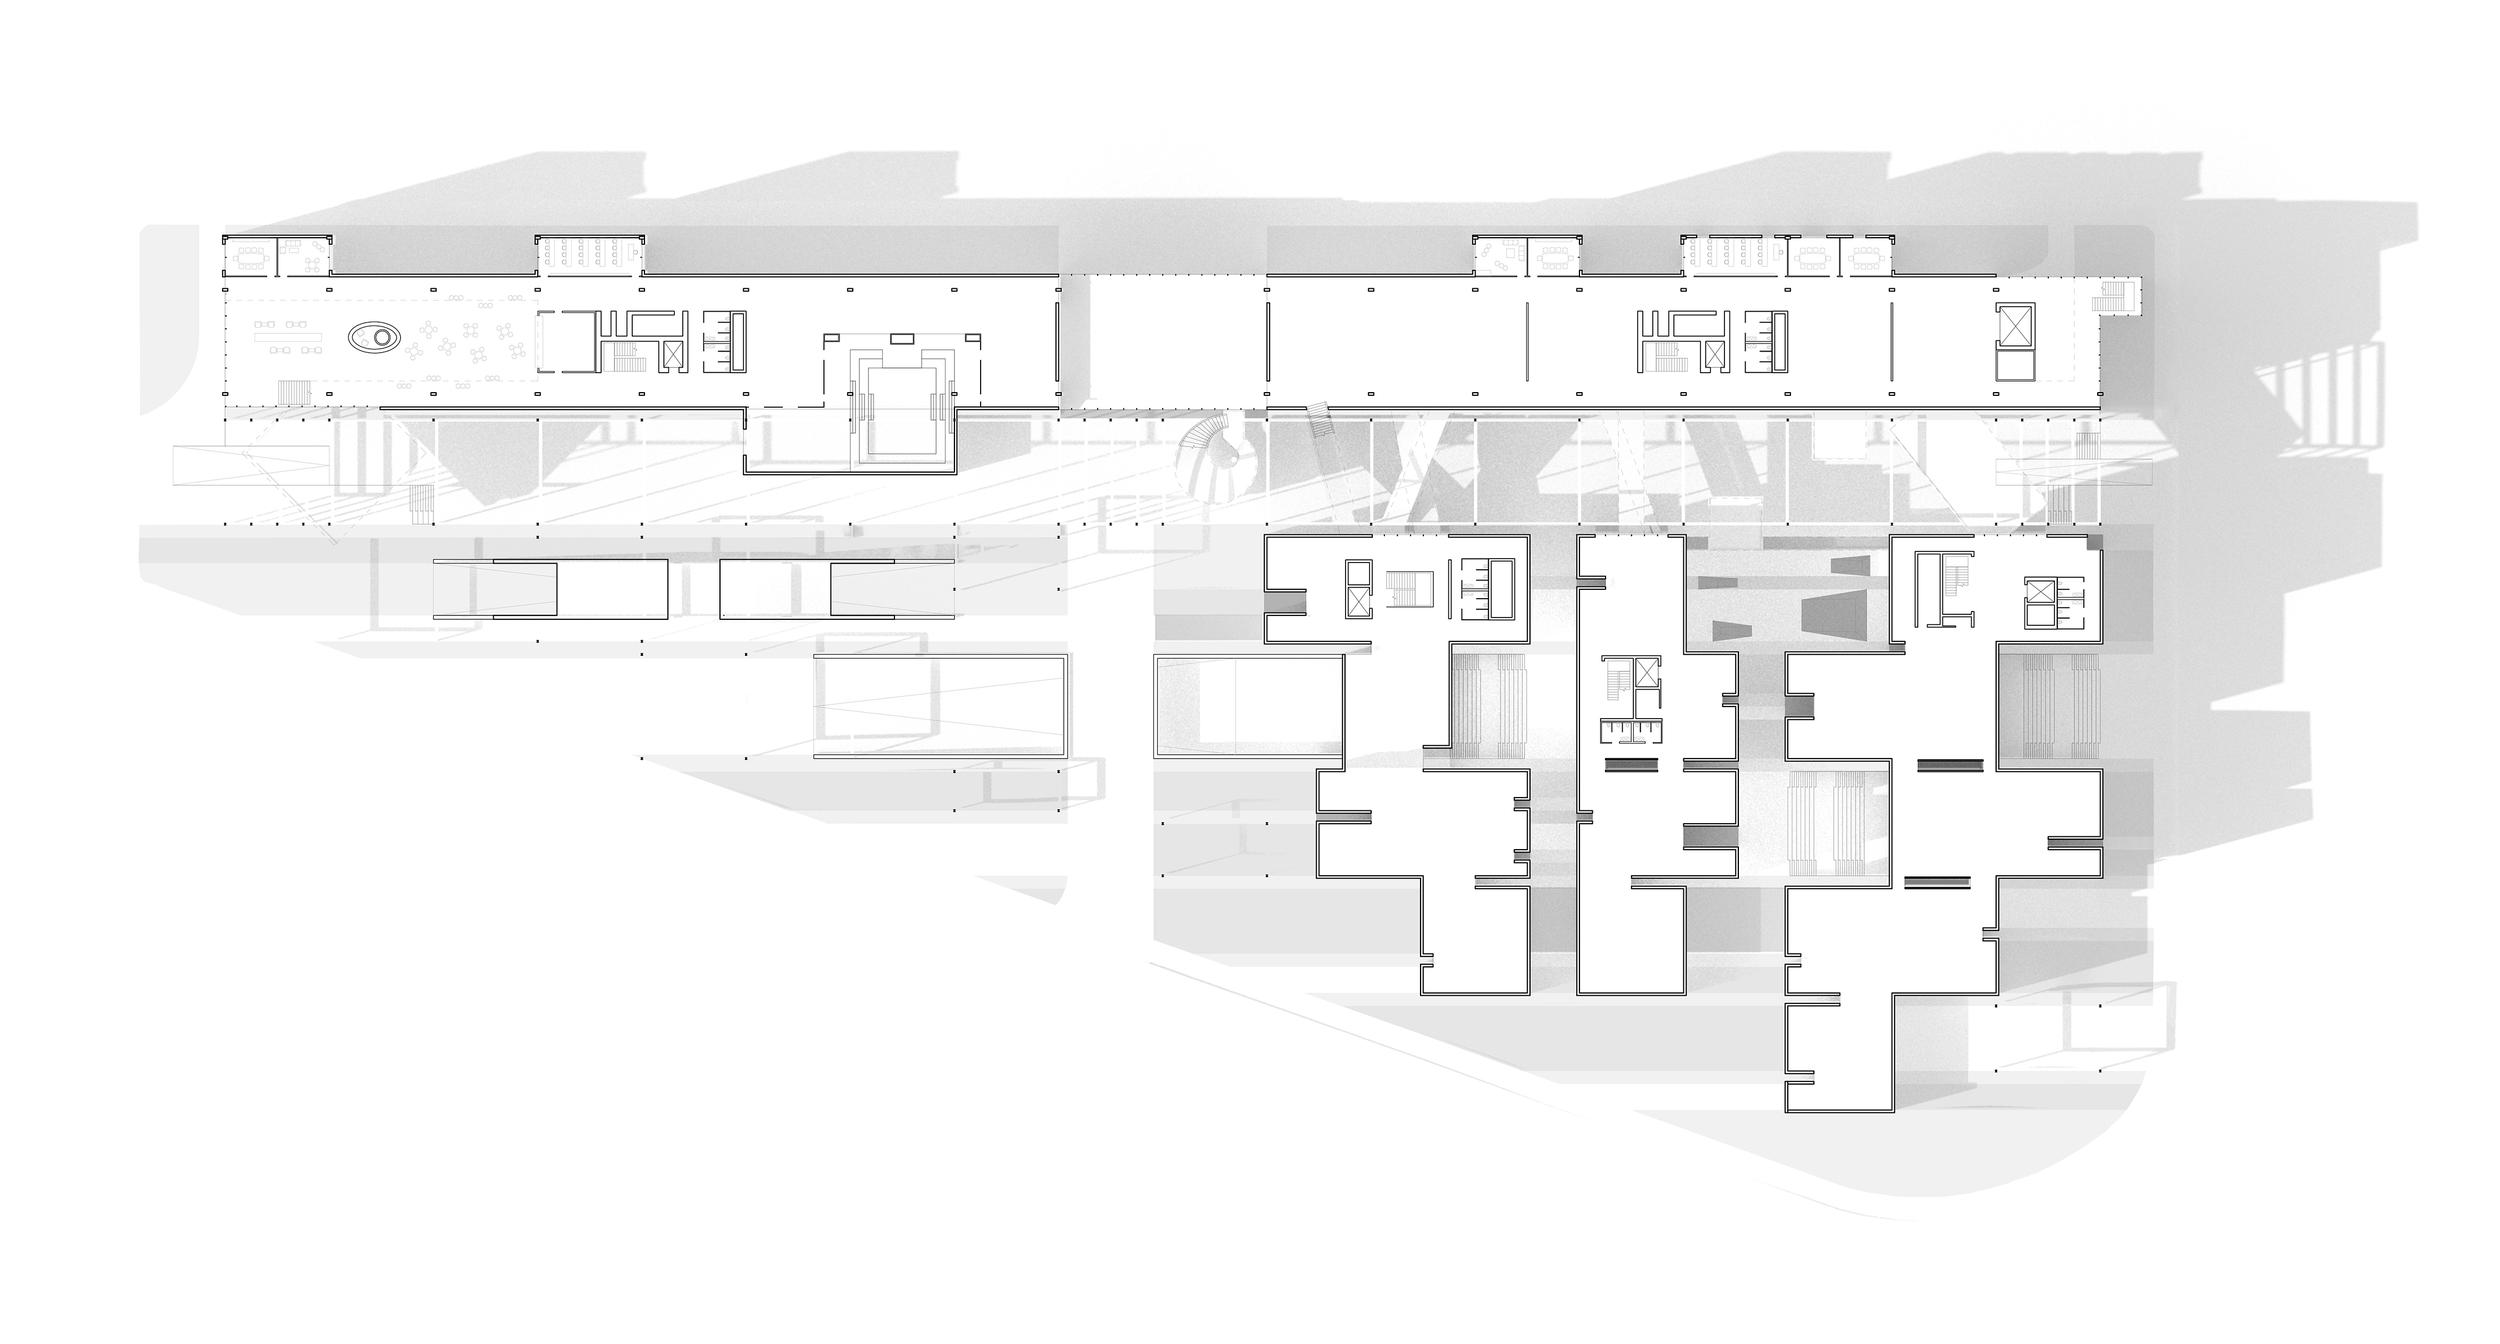 151211_Floorplan 1_small.jpg